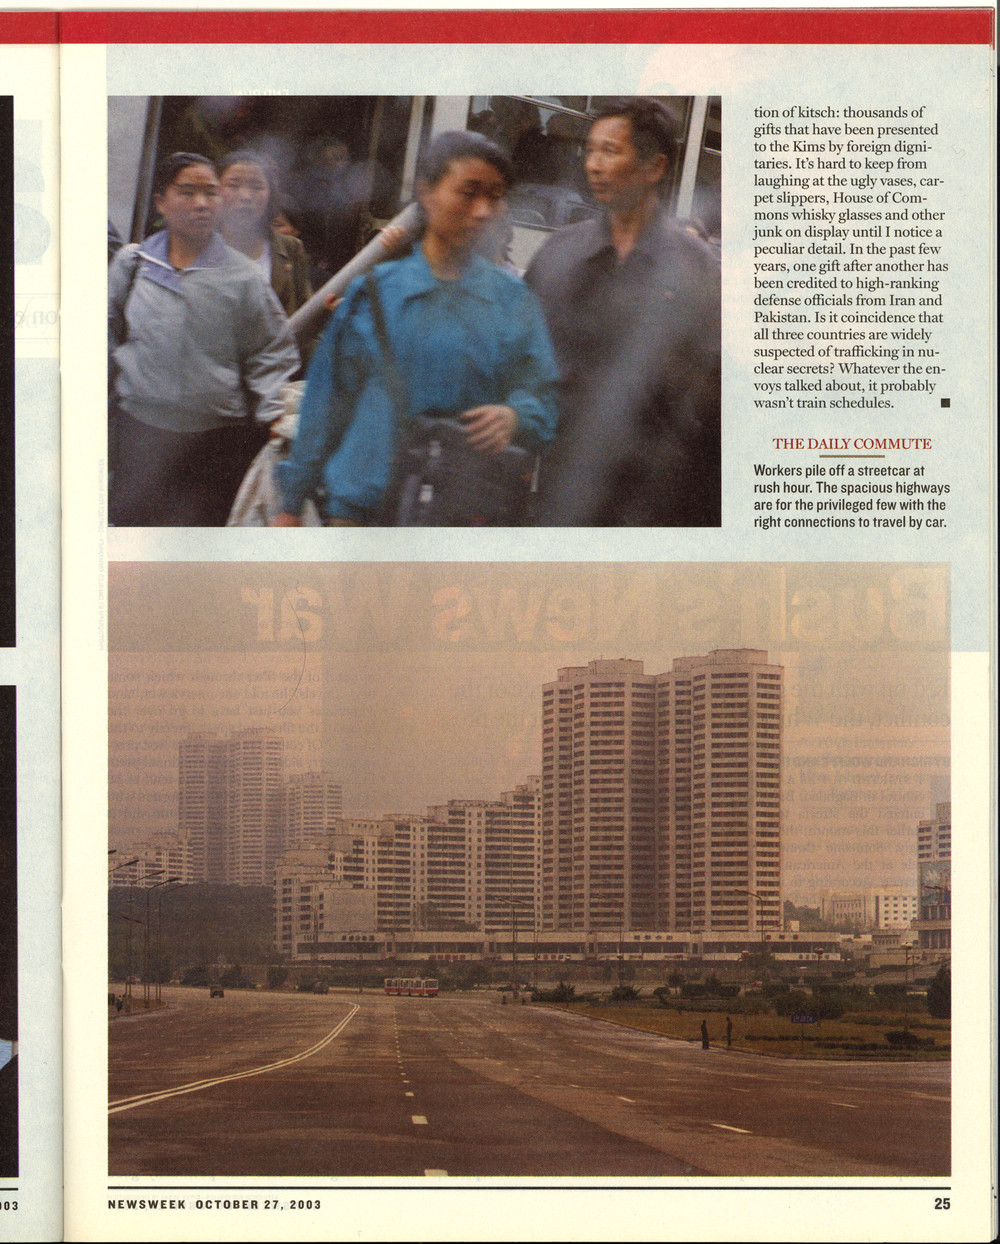 10222003_NEWSWEEK_NORTH KOREA_4.jpg